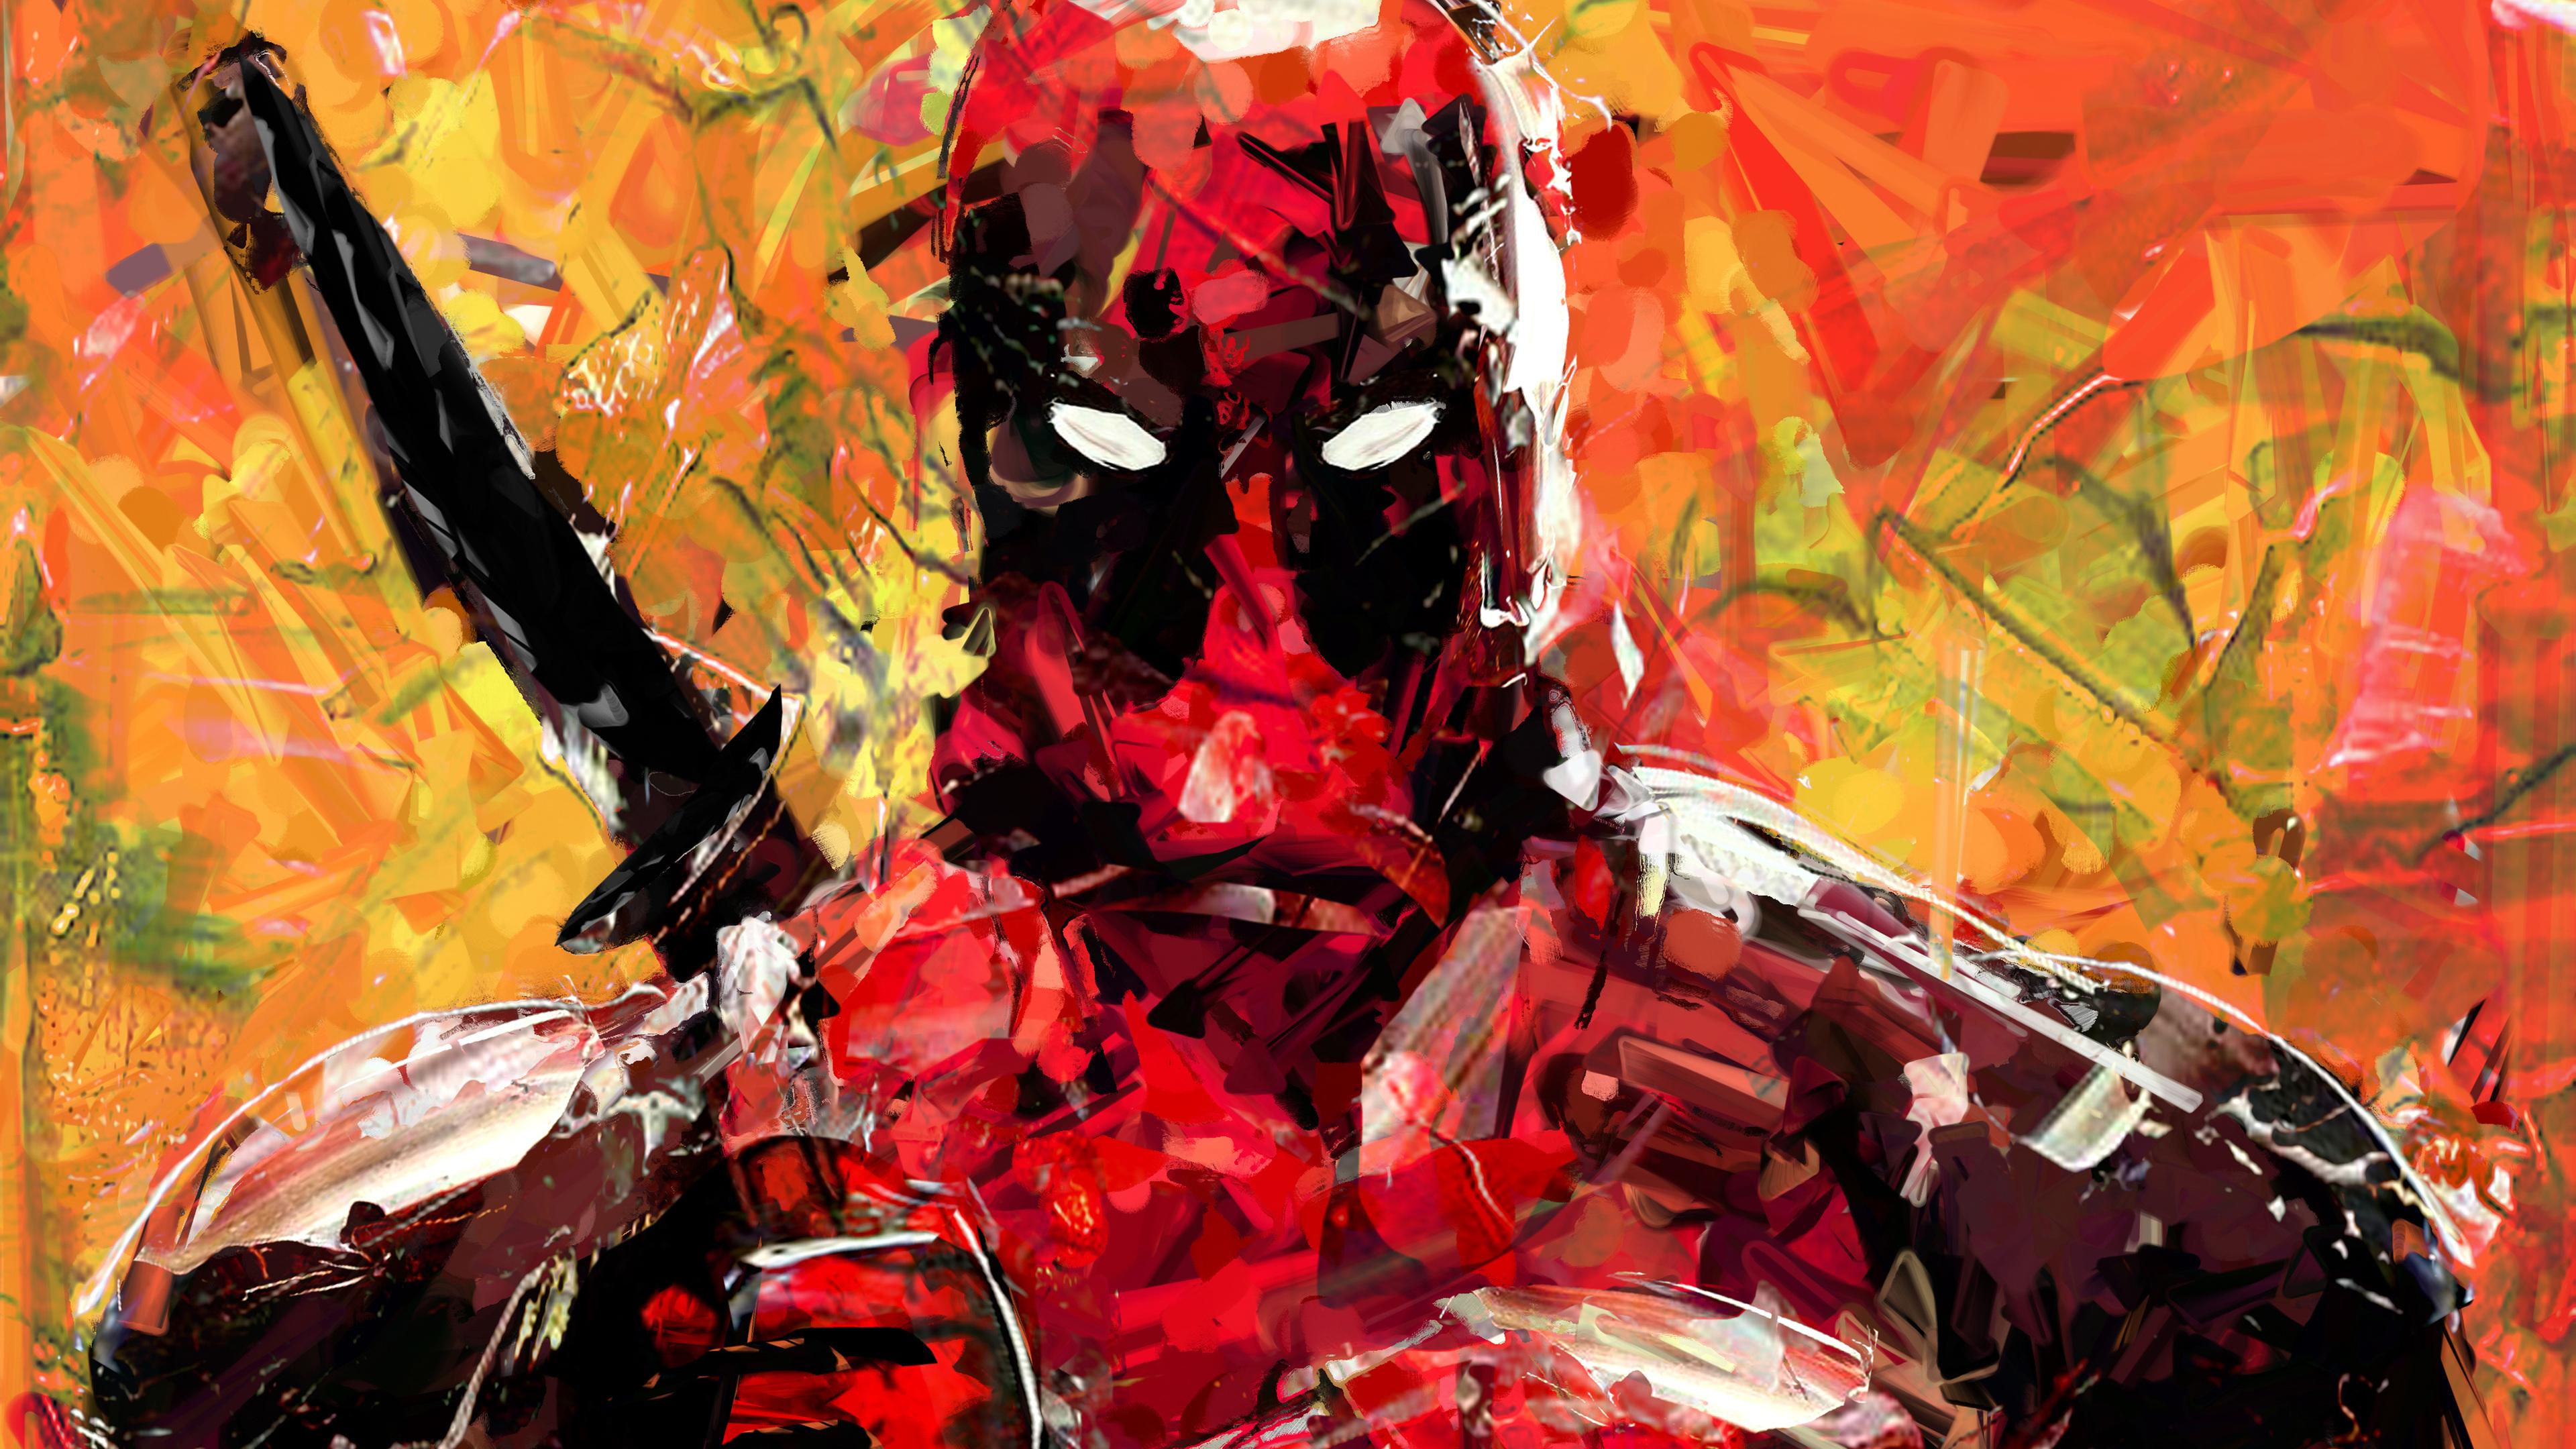 deadpool 8k art 1536523694 - Deadpool 8k Art - superheroes wallpapers, hd-wallpapers, digital art wallpapers, deadpool wallpapers, deadpool 2 wallpapers, artwork wallpapers, 8k wallpapers, 5k wallpapers, 4k-wallpapers